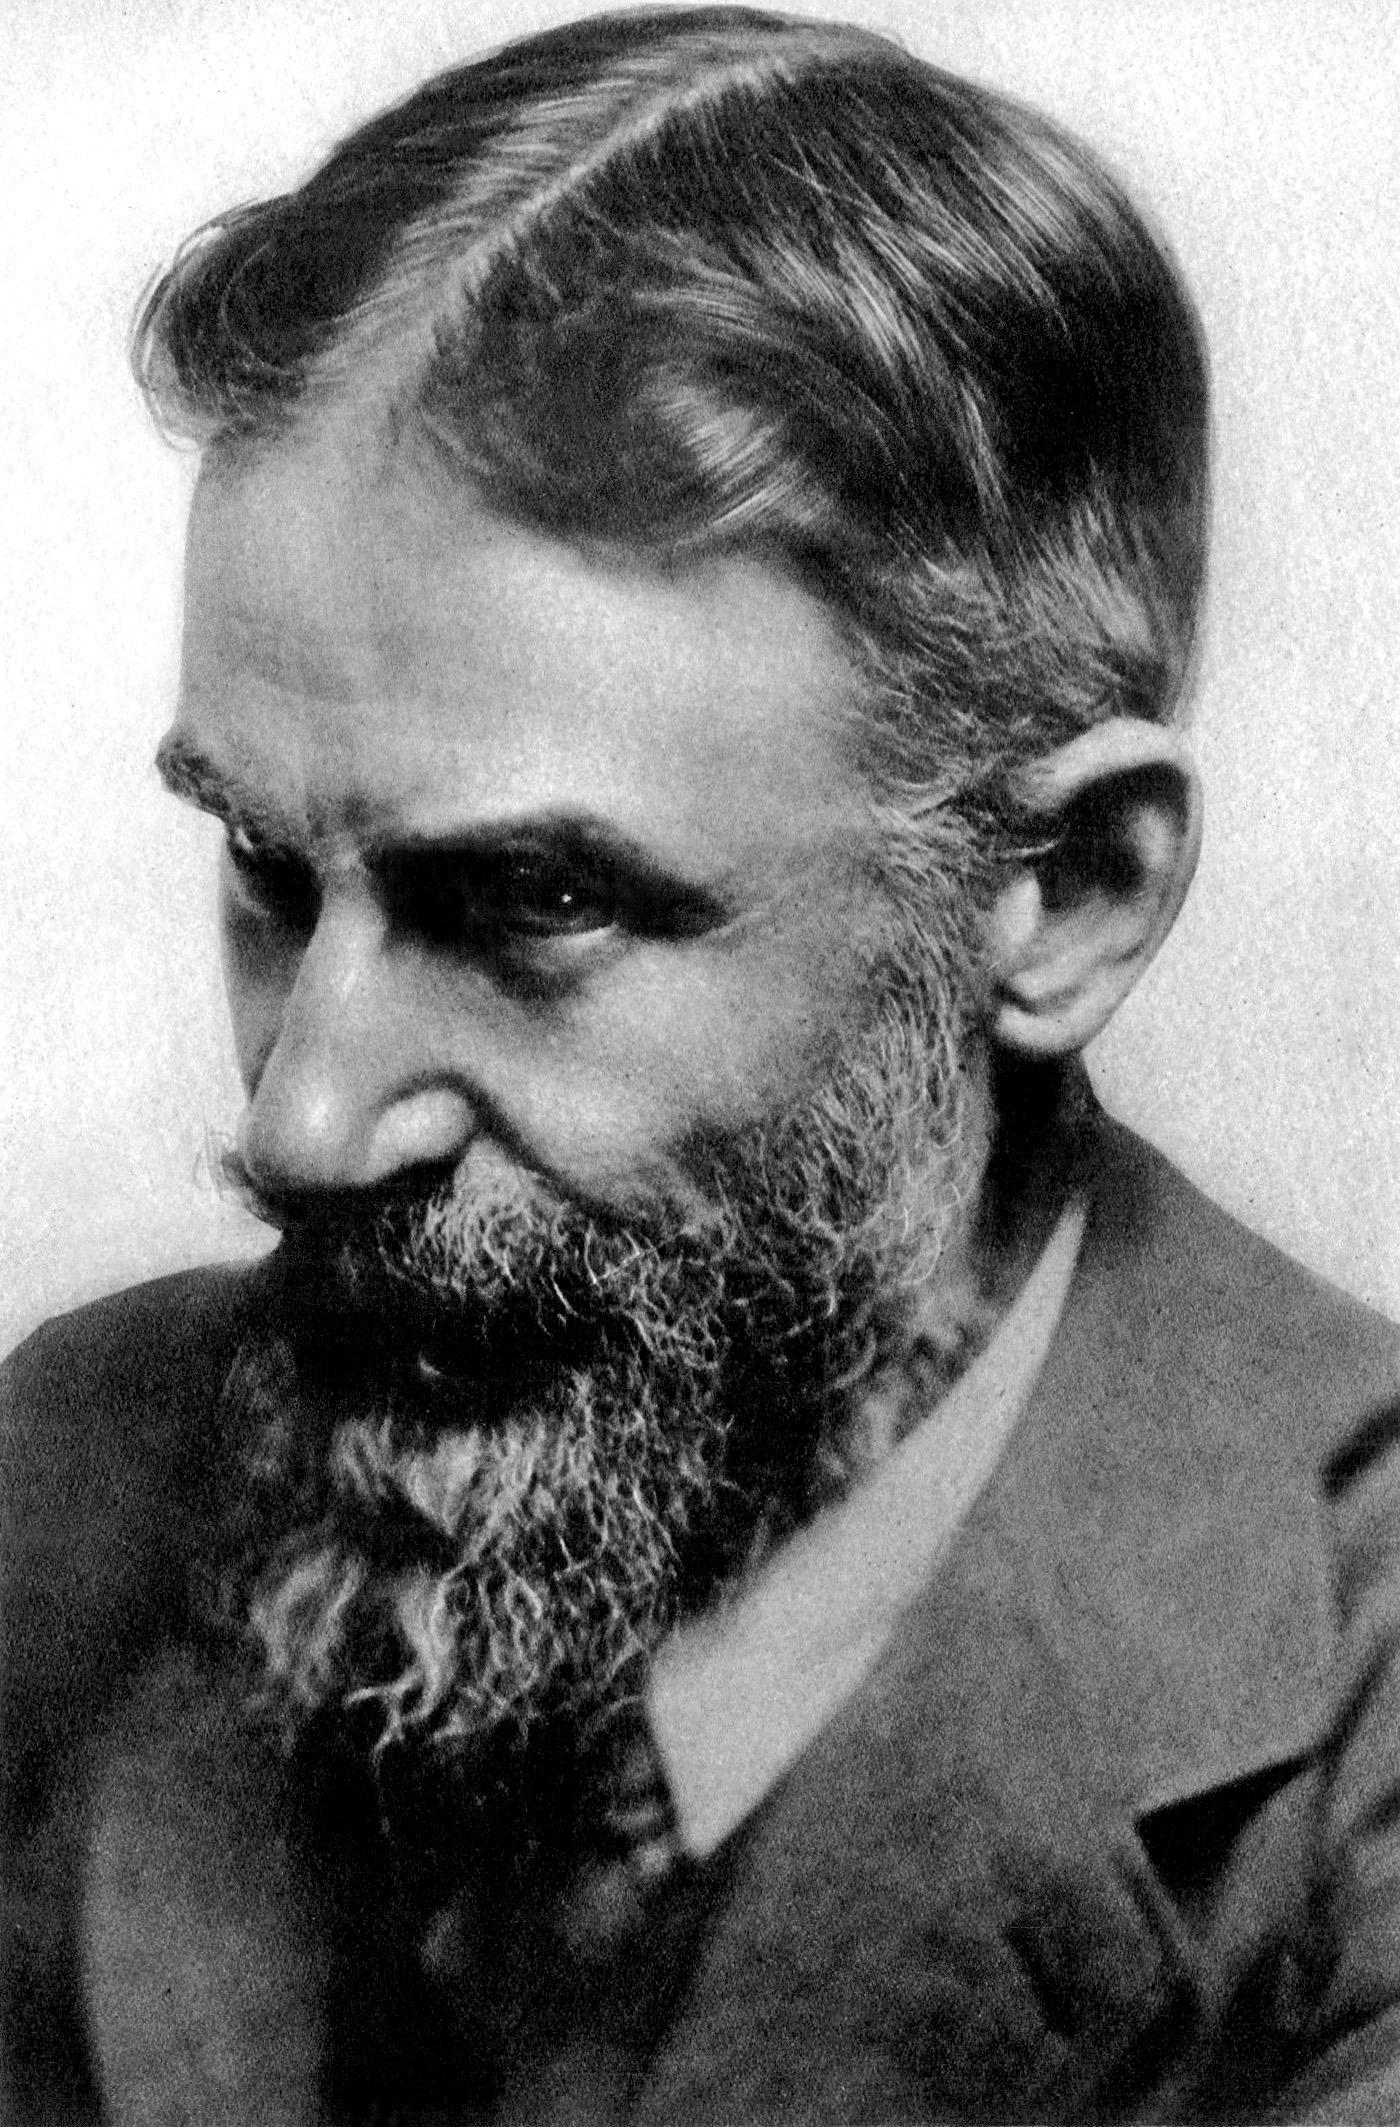 G.B. Shaw